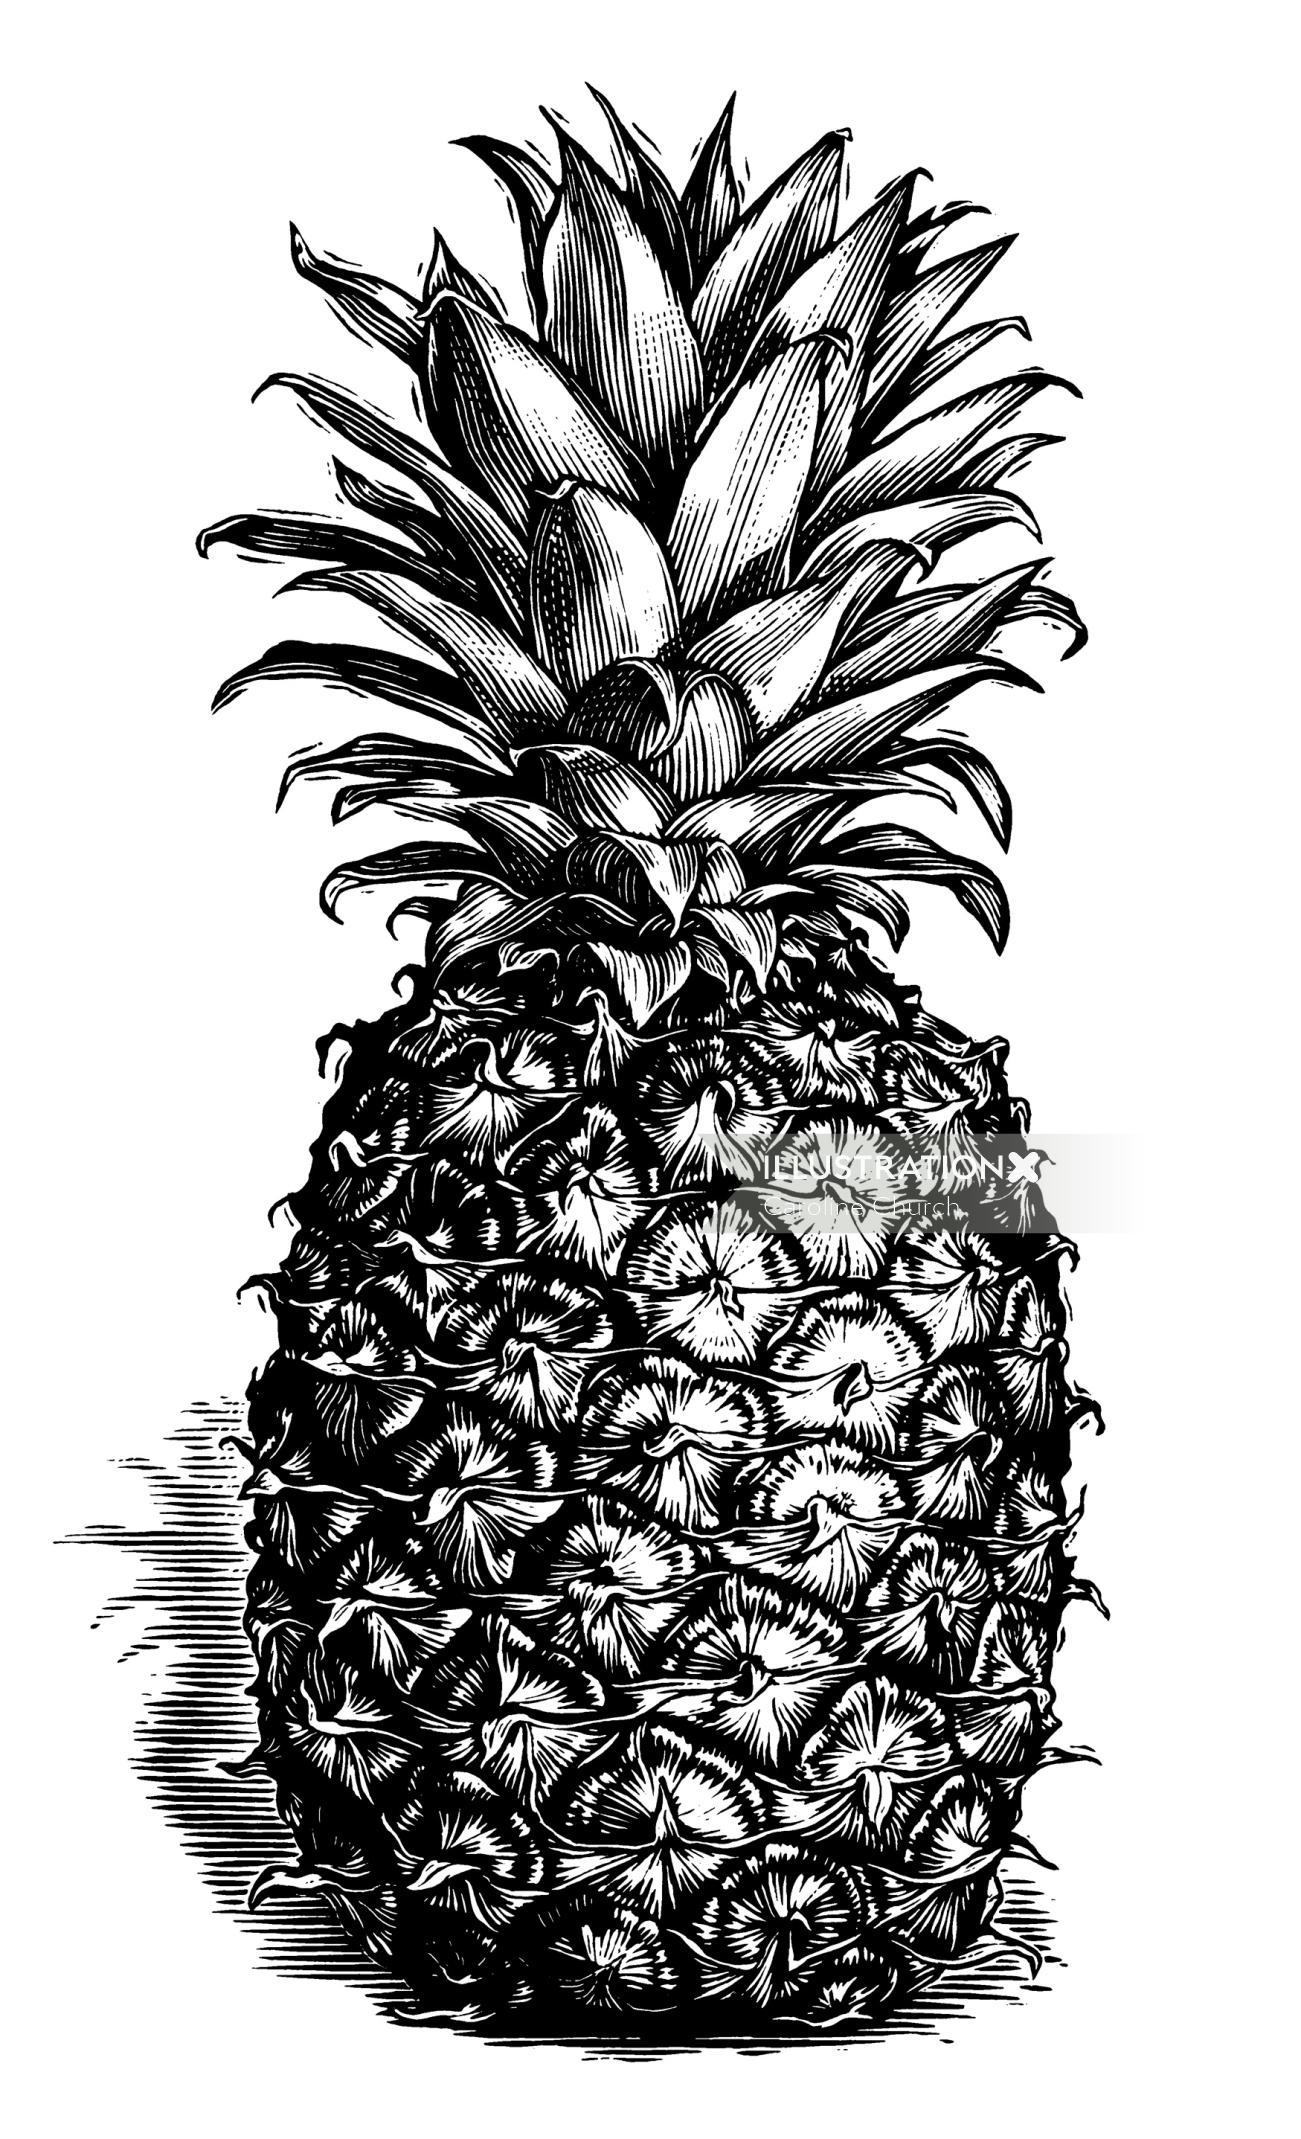 Pineapple black and white illustration